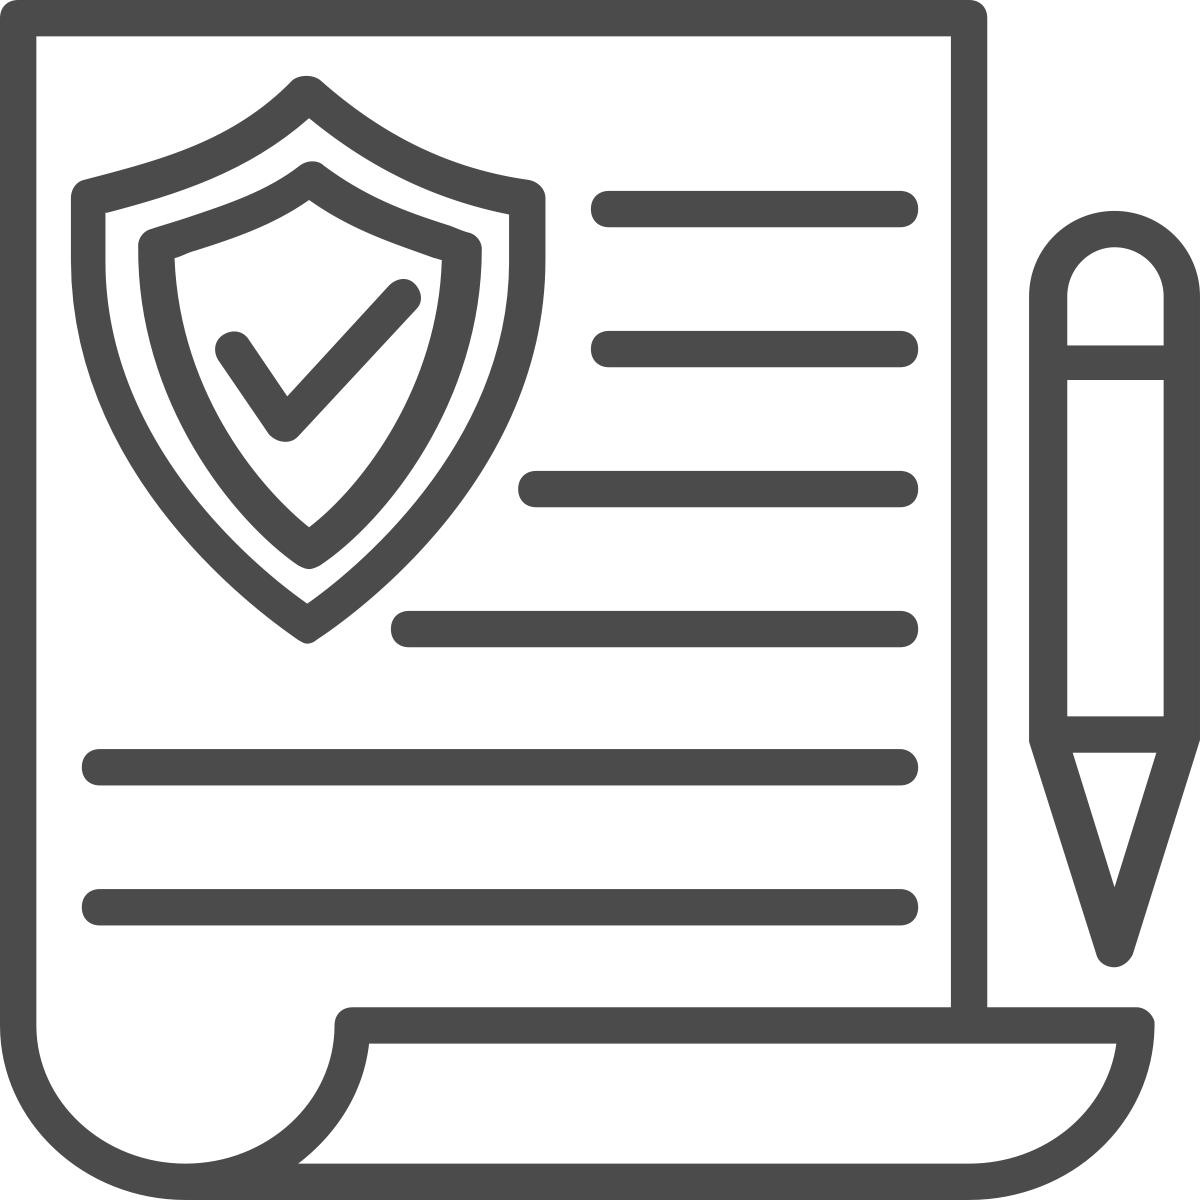 Insurance_noun_insurance policy_1383225